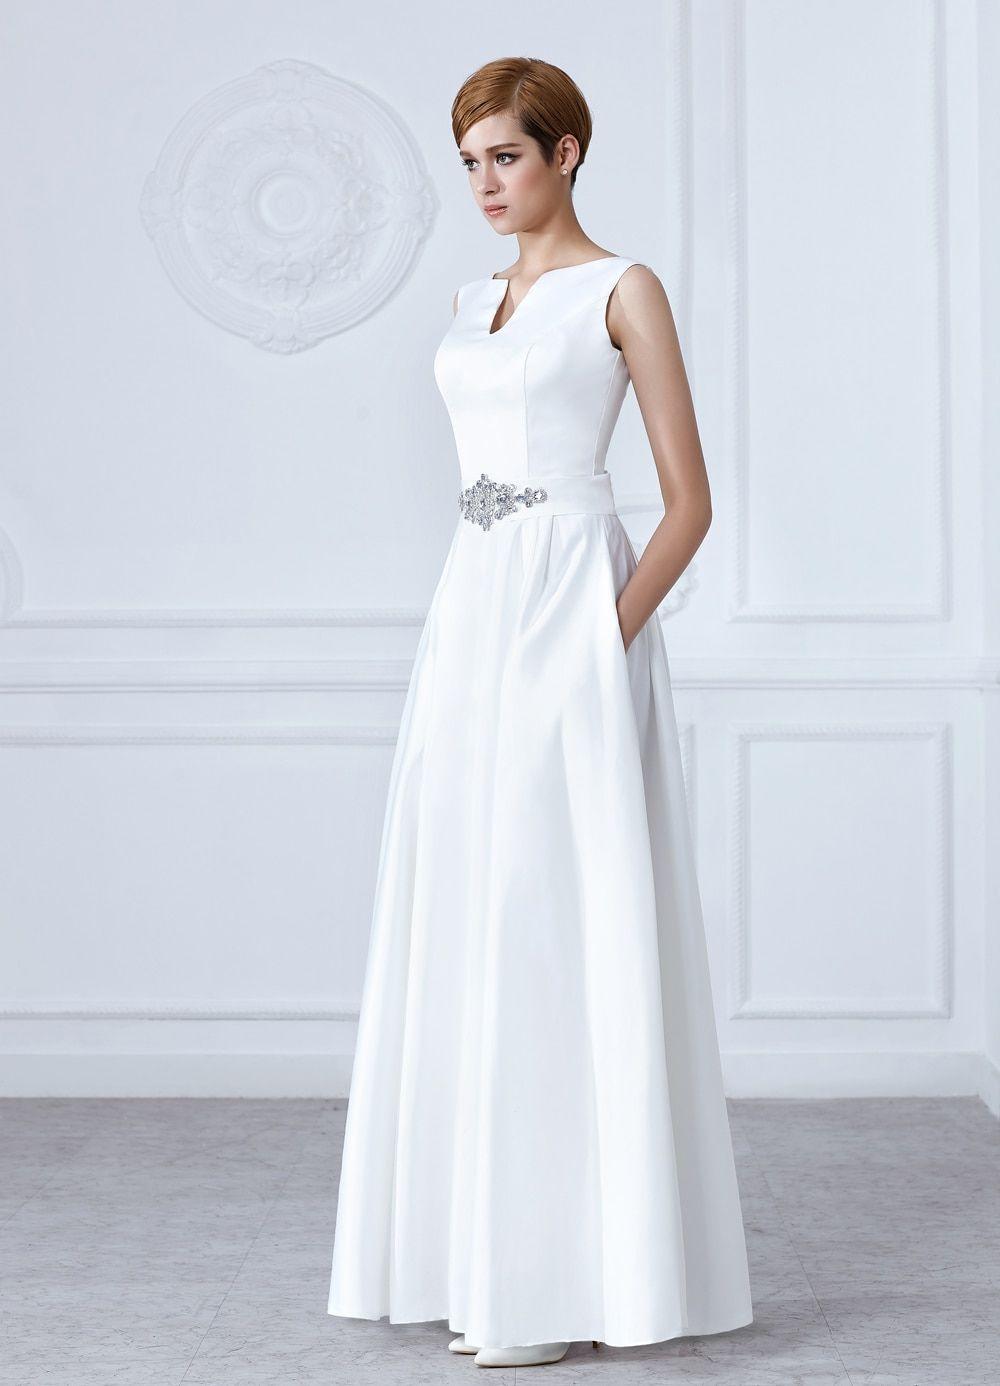 a9b424b8f9 SOCCI White V-Neck Crystal sashes Long Wedding Dresses Sleeveless ...